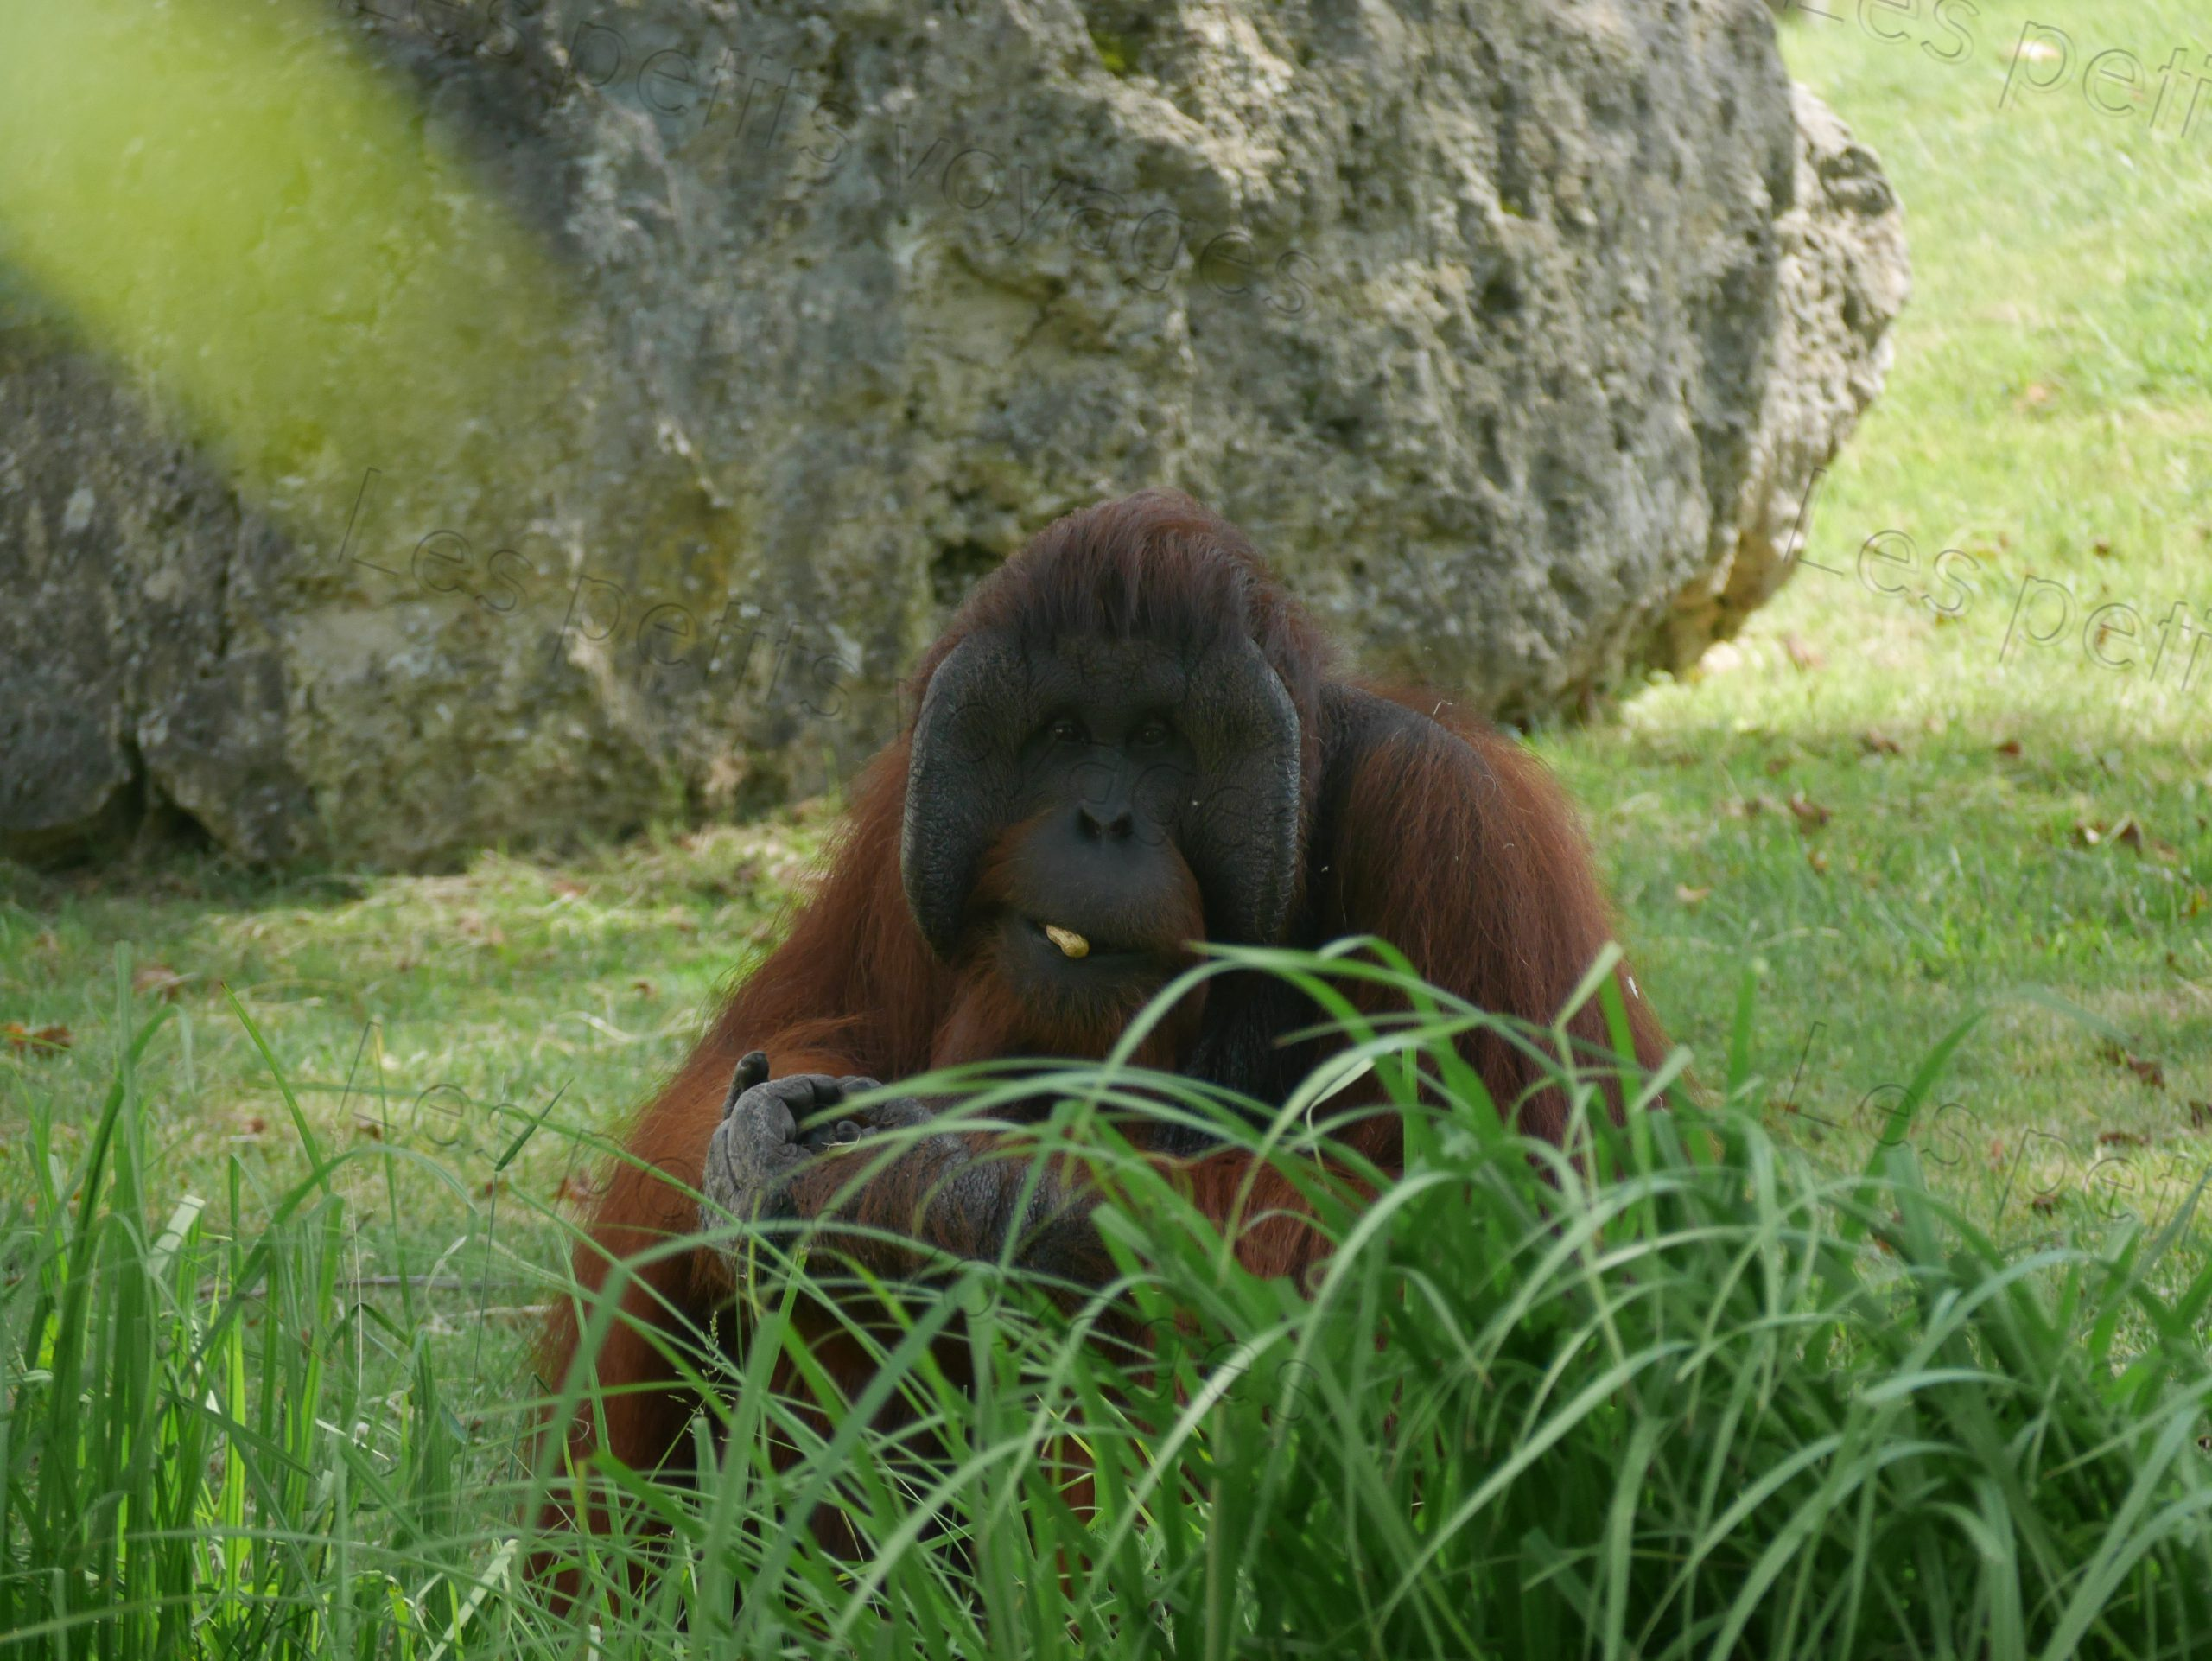 orang outang zoo beauval